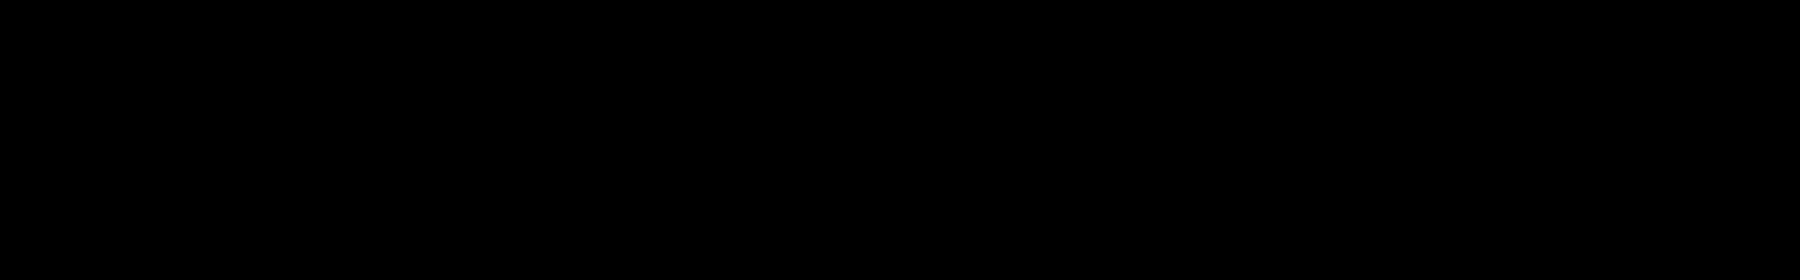 AudioKaviar 05: Reggaeton for Ableton Live audio waveform